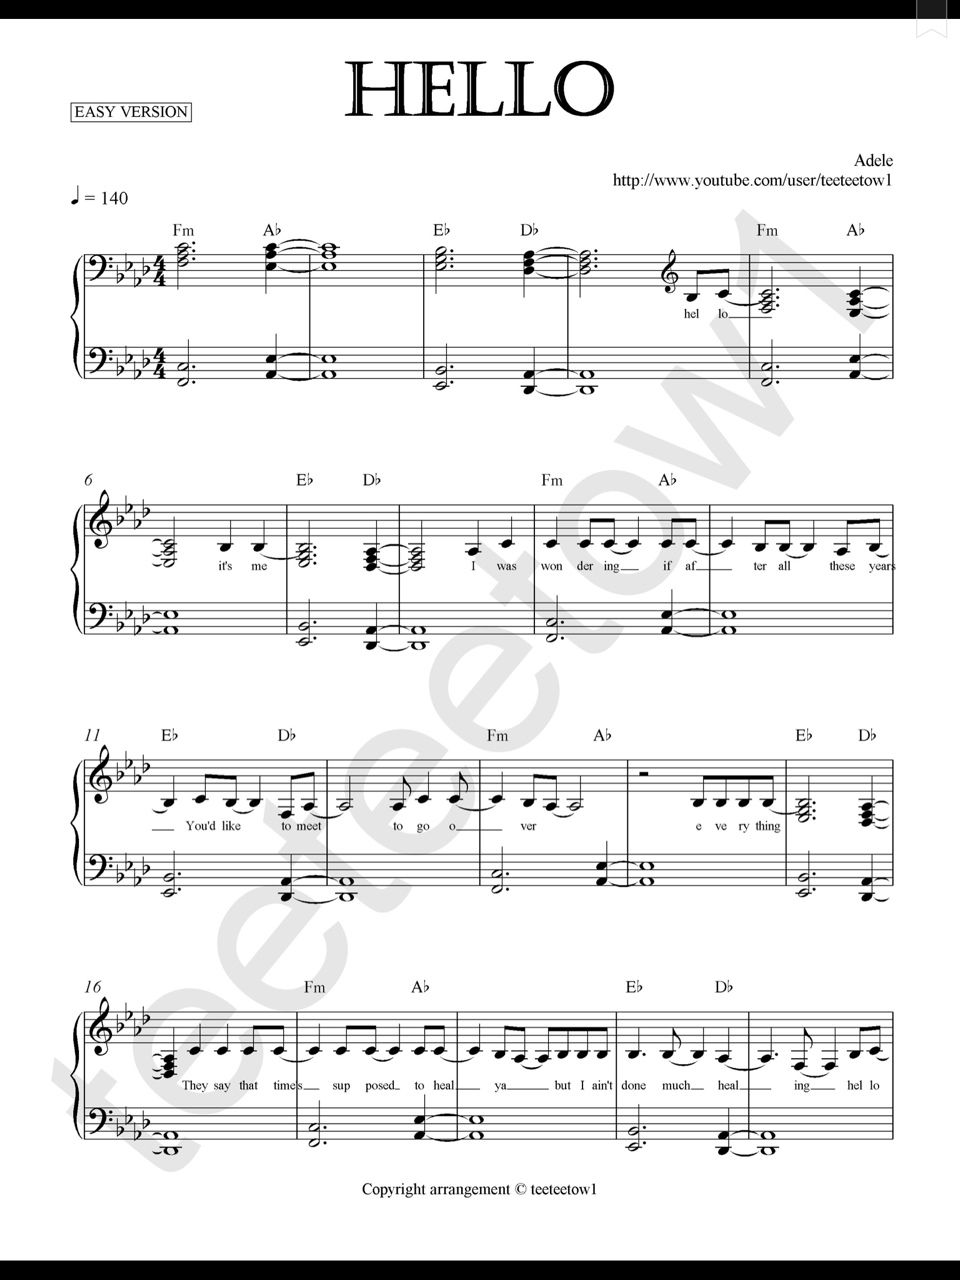 adele hello lyrics file download